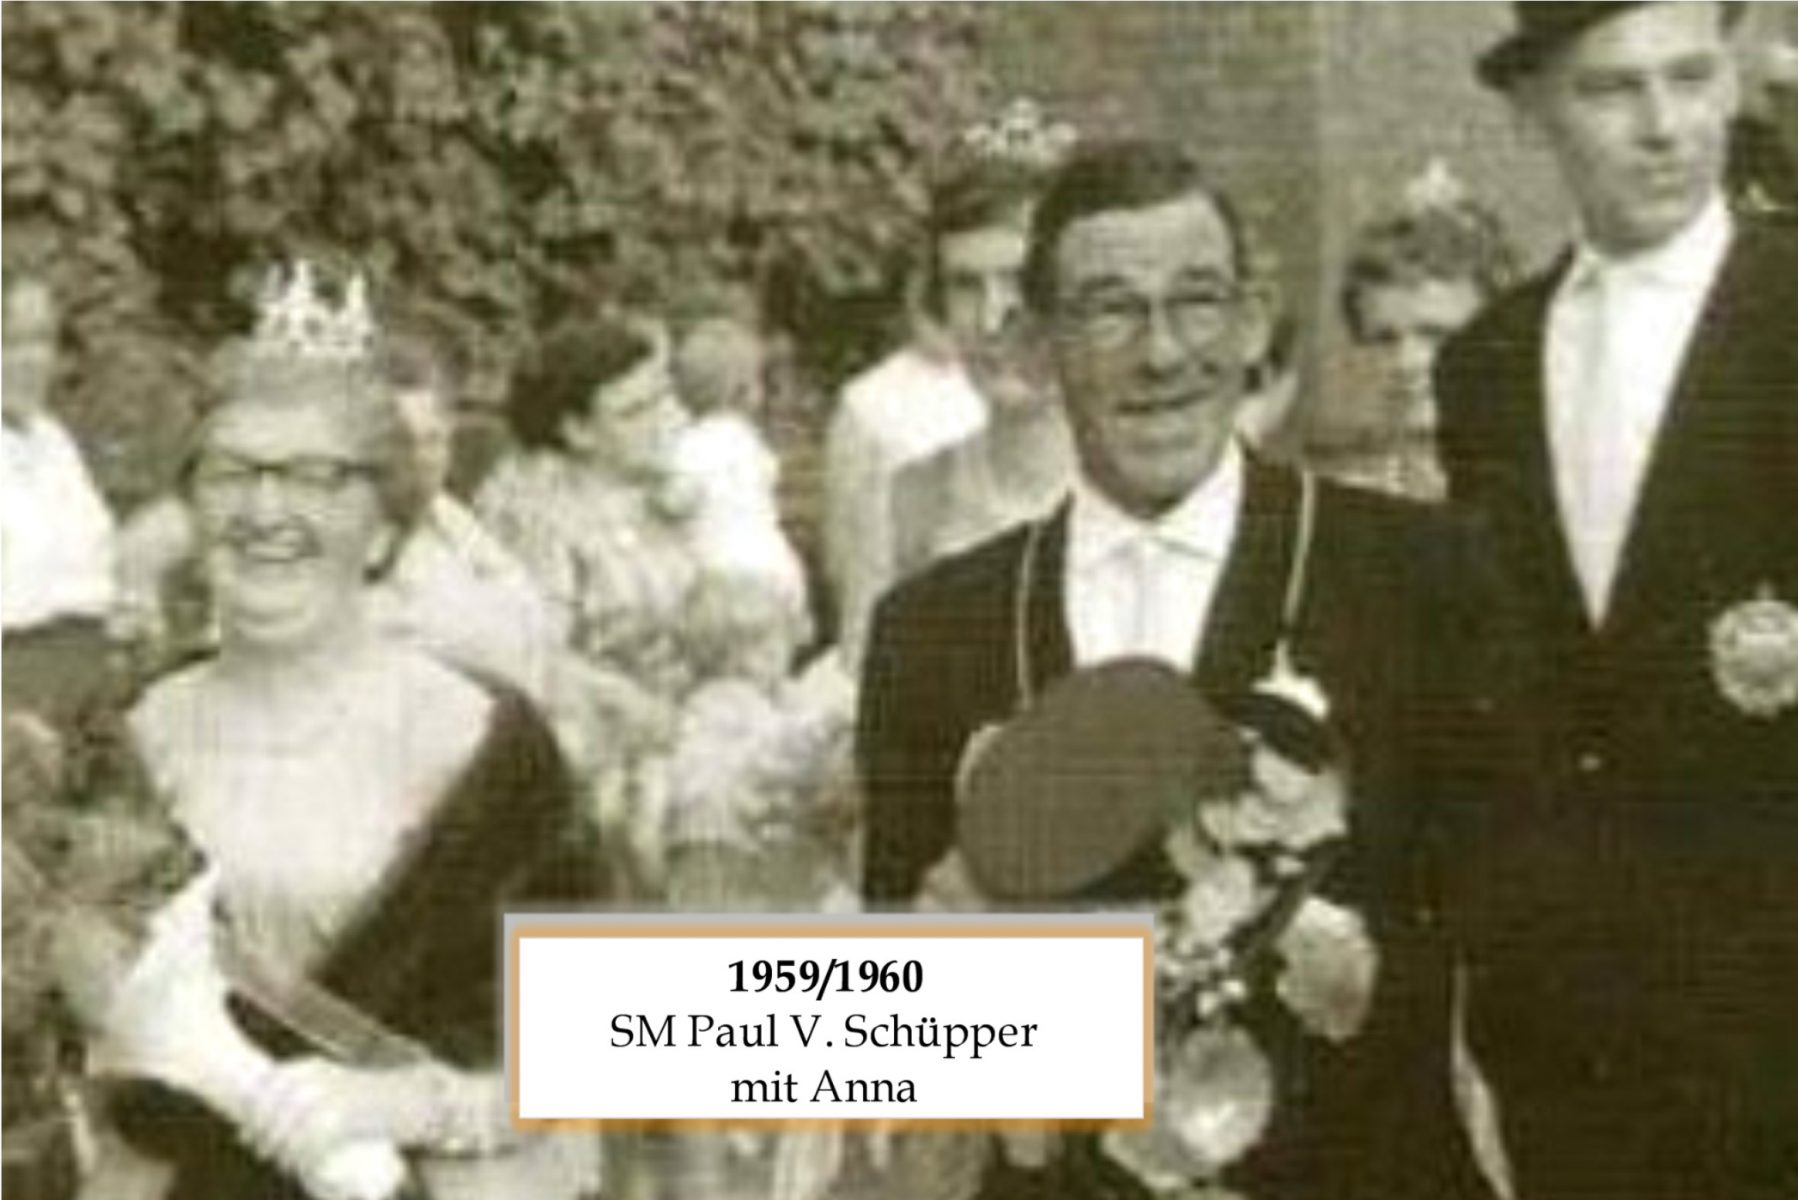 SM 1959/60 Paul V Schüpper mit Anna